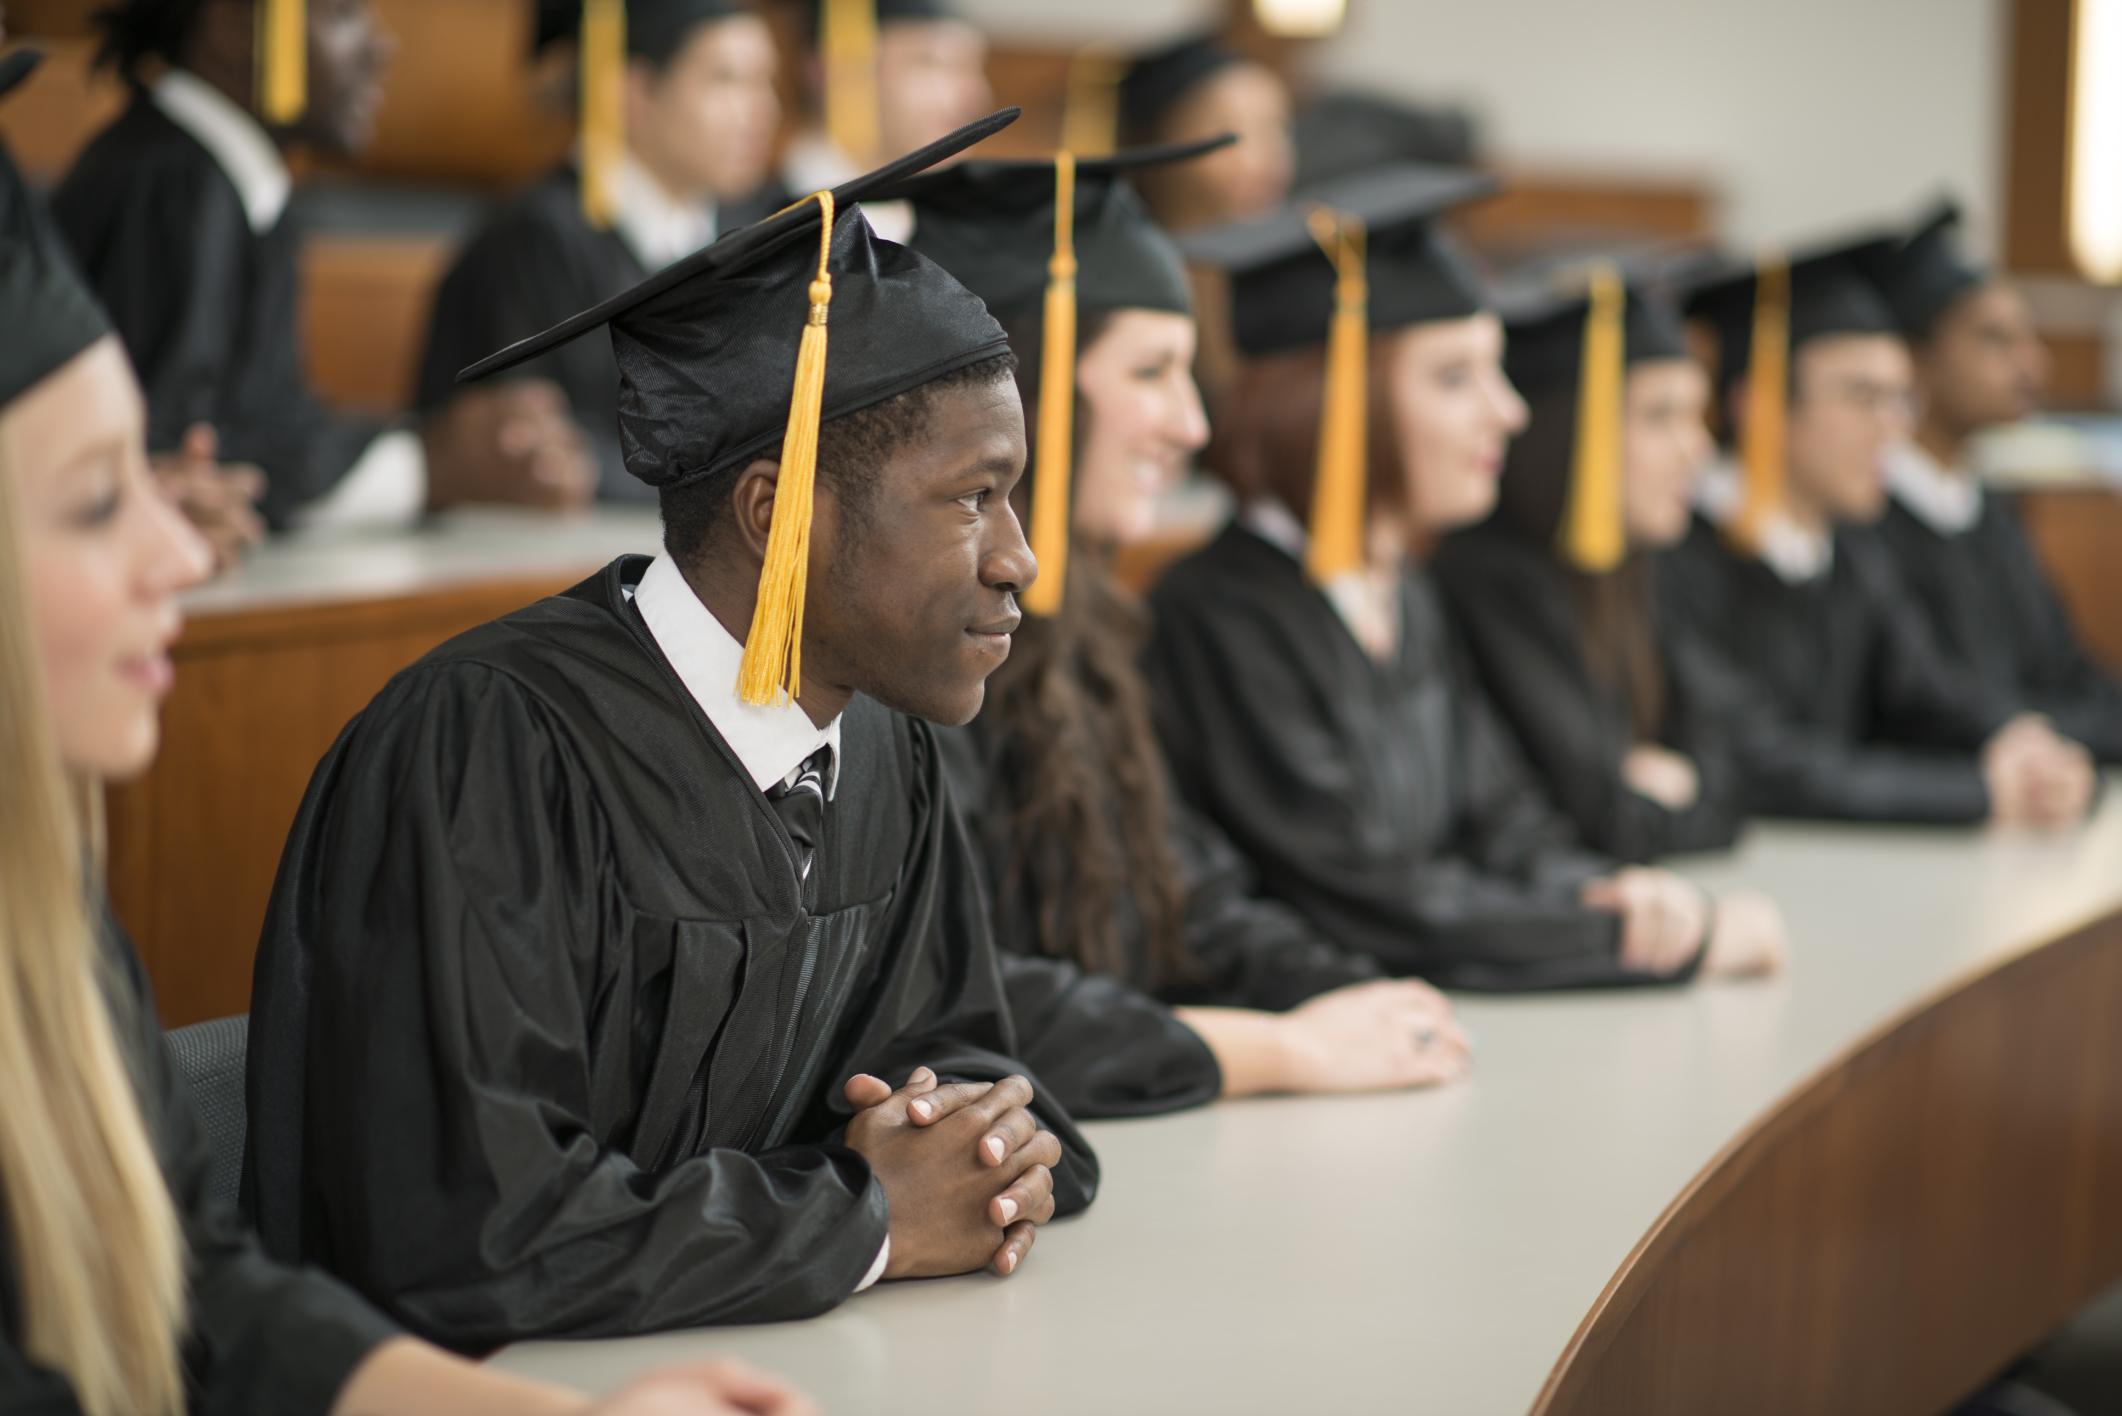 University Graduates Sitting in a Row